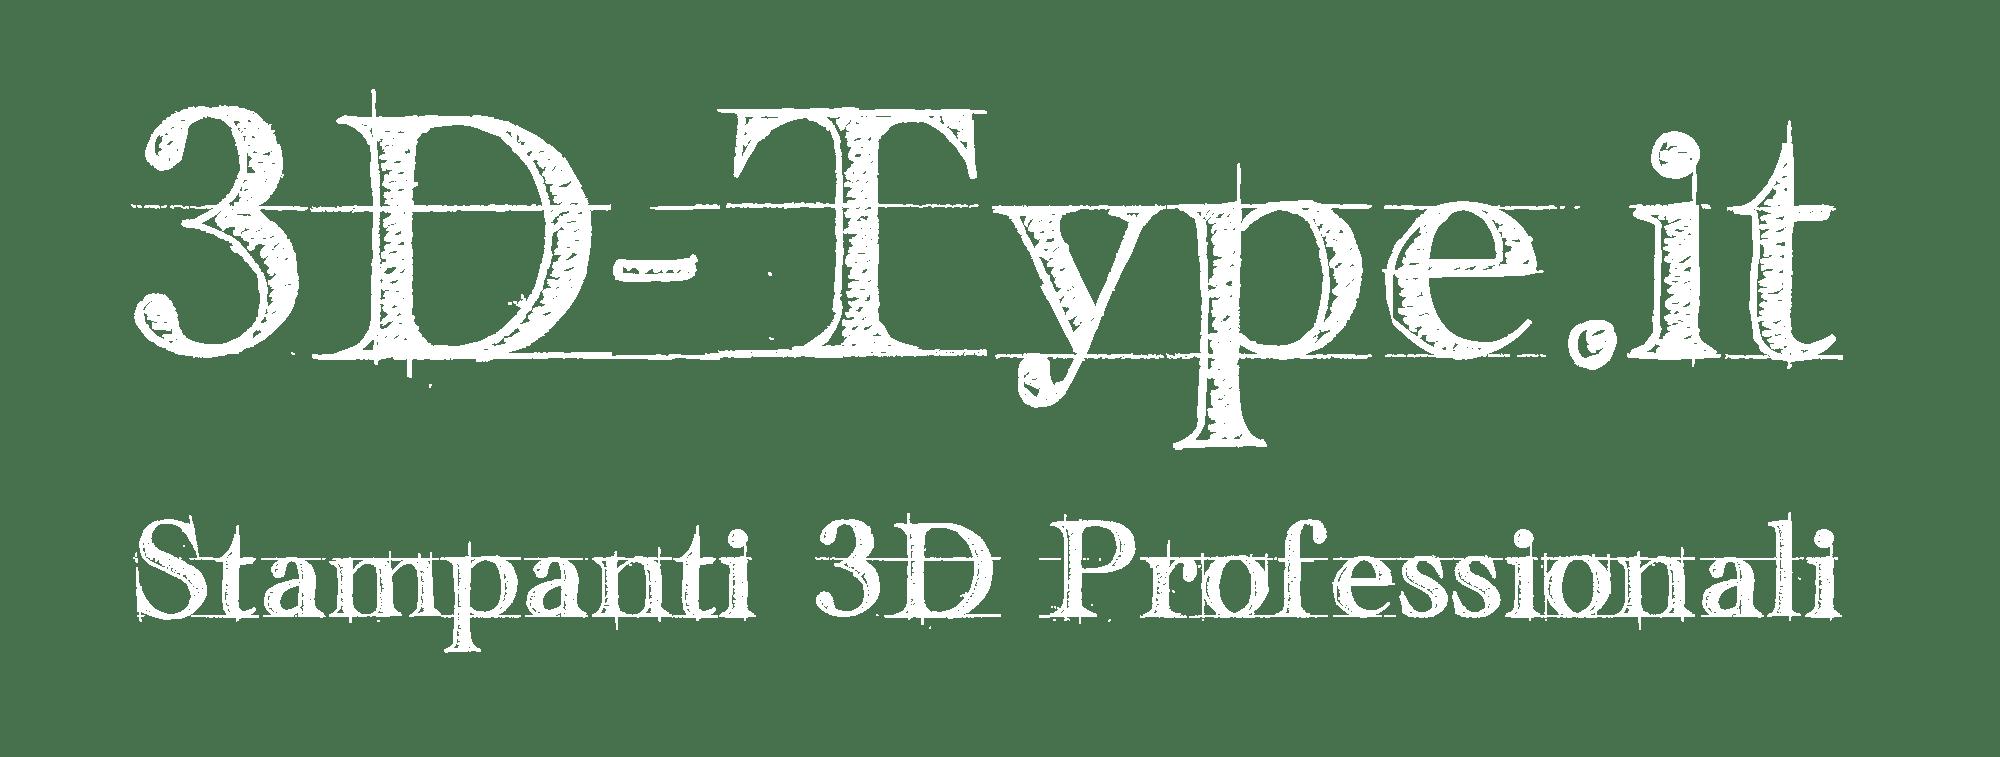 stampante d professionali